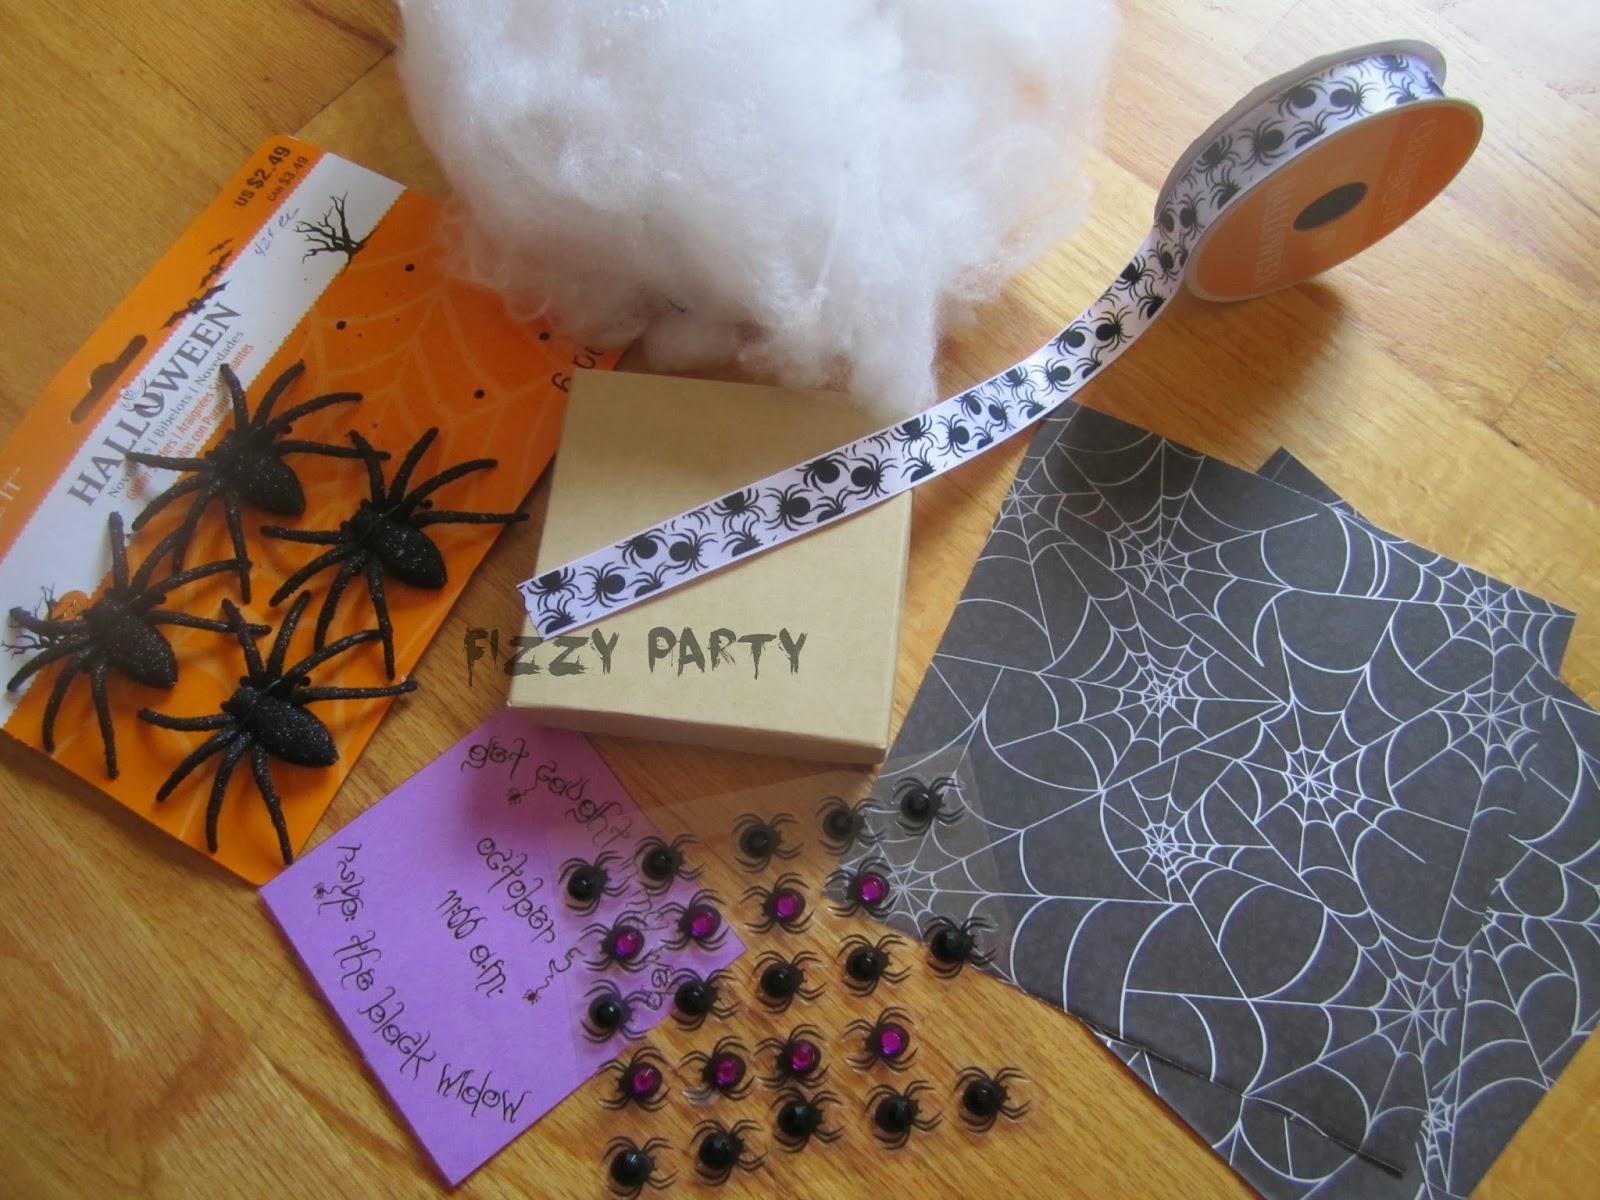 Fizzy Party: DIY Halloween Invitation